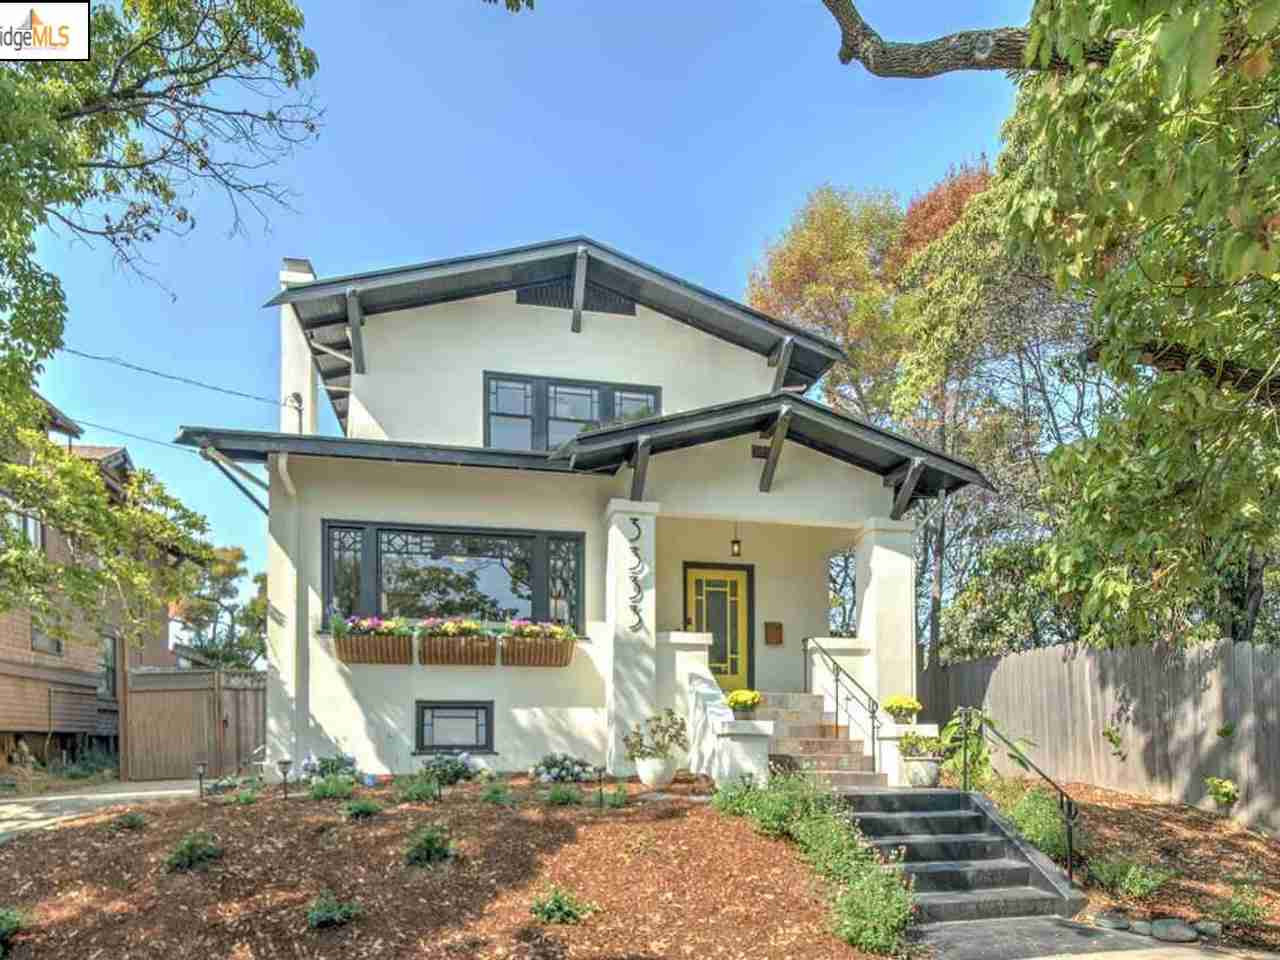 3333 Kempton Ave Oakland, CA, 94611